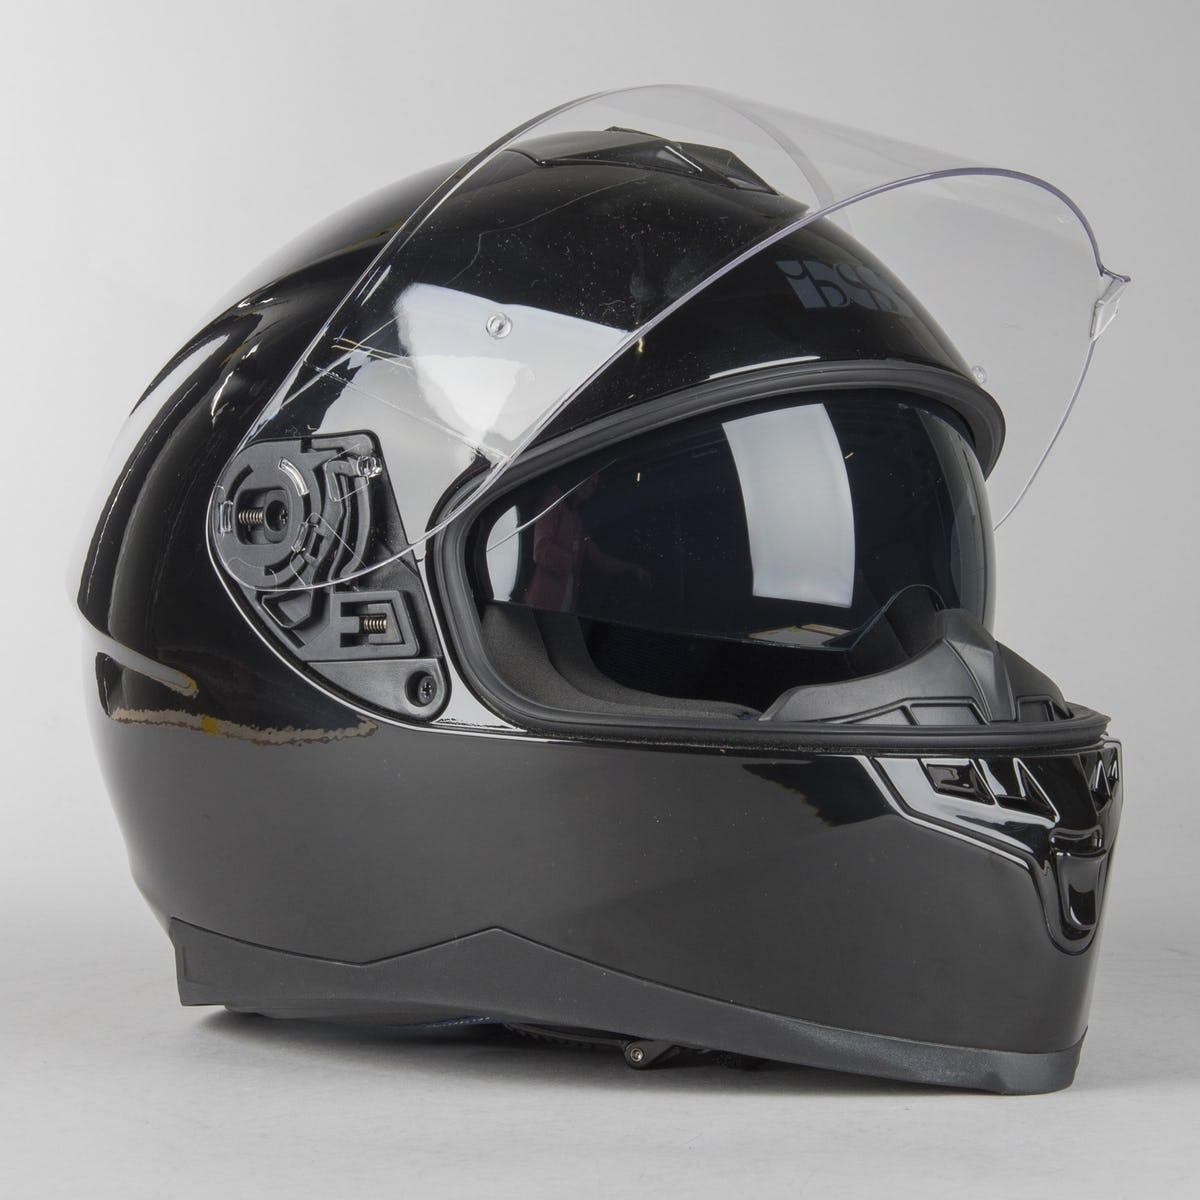 Мото Шлем интеграл IXS 1100 1.0 Full Face Helmet Black  Черный глянец